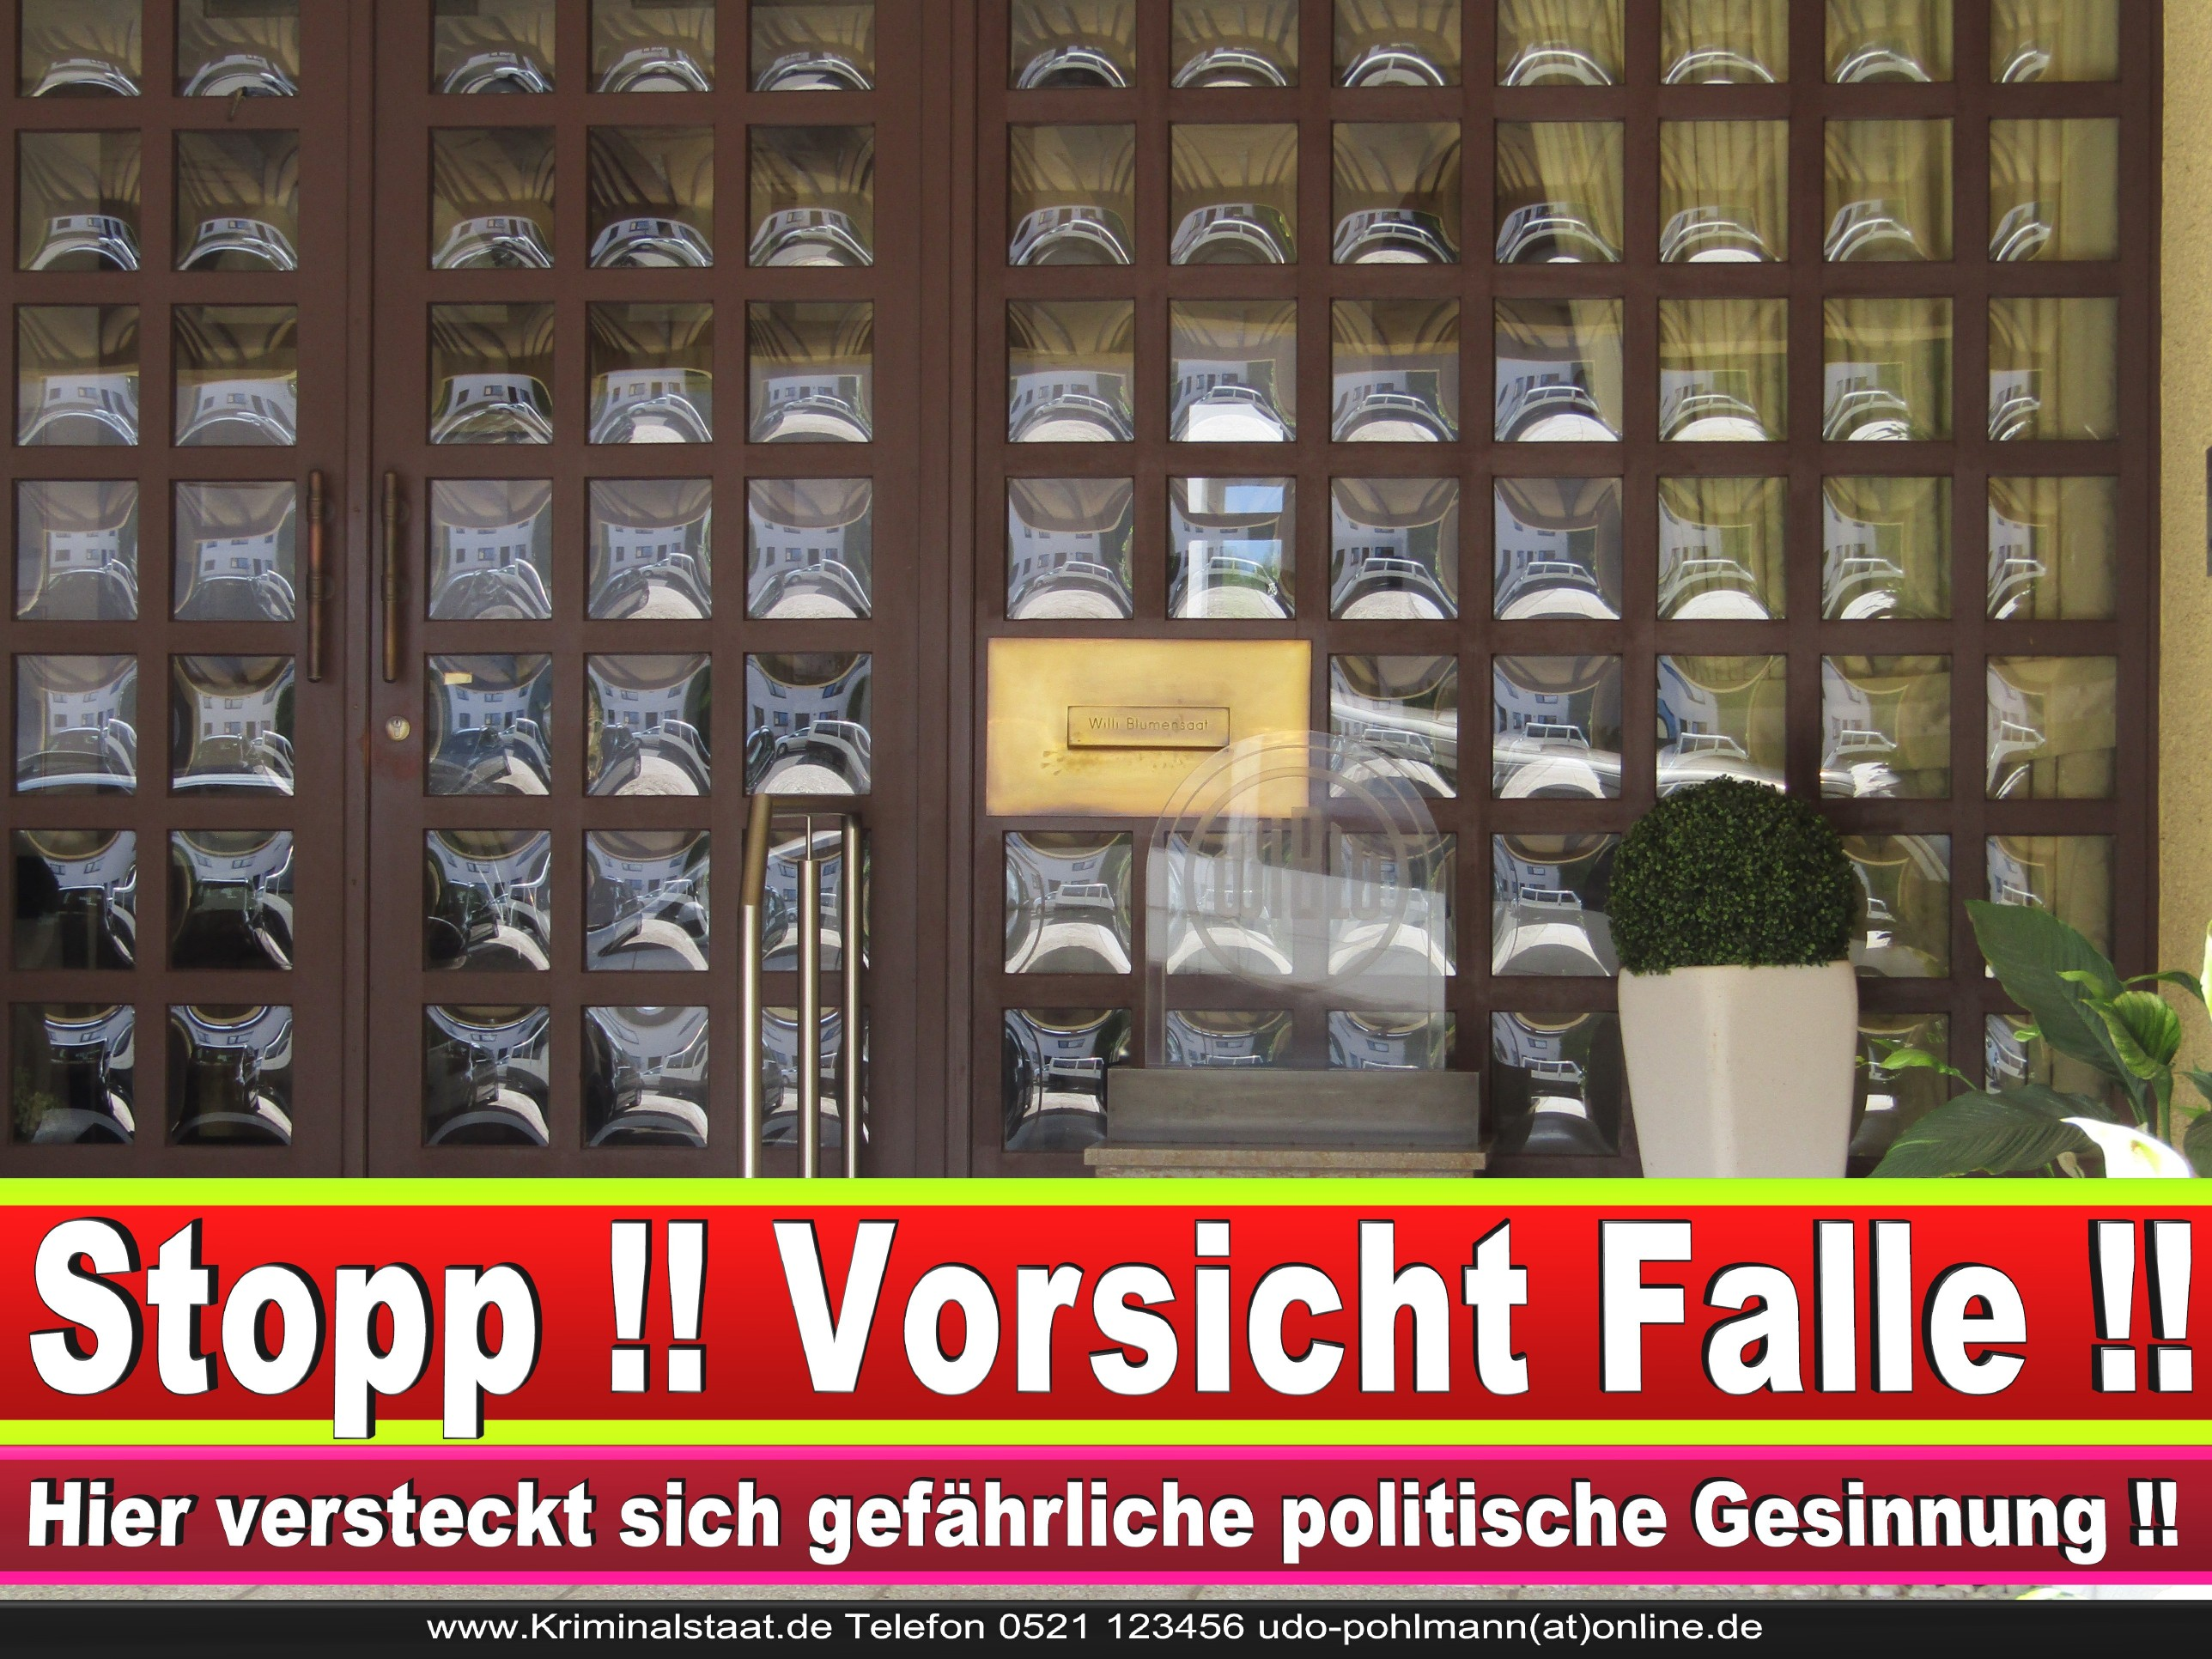 WILLI BLUMENSAAT CDU BIELEFELD LANDTAGSWAHL BUNDESTAGSWAHL BÜRGERMEISTERWAHL